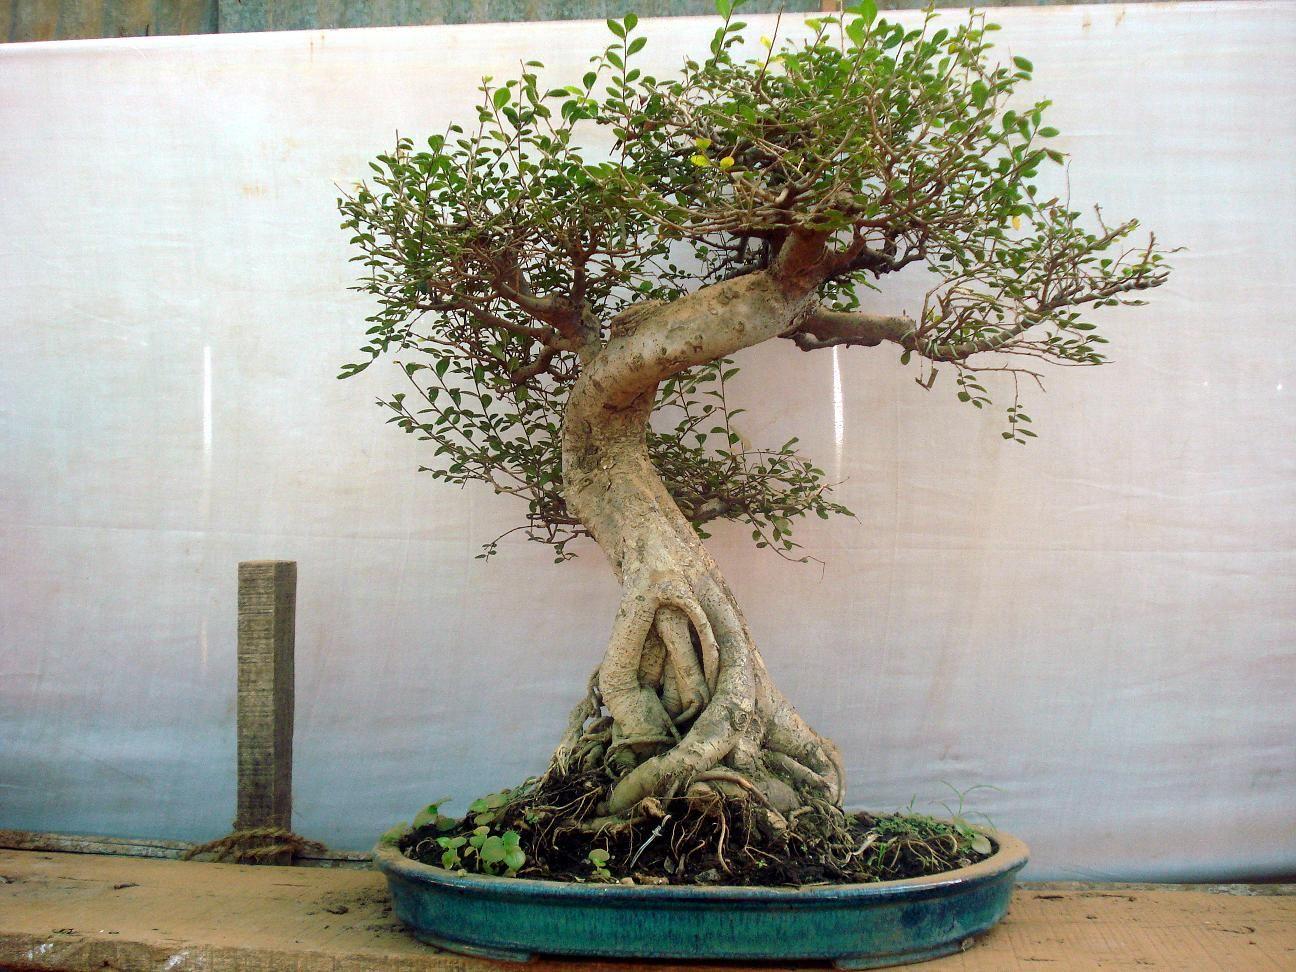 How To Make An Artificial Bonsai Tree